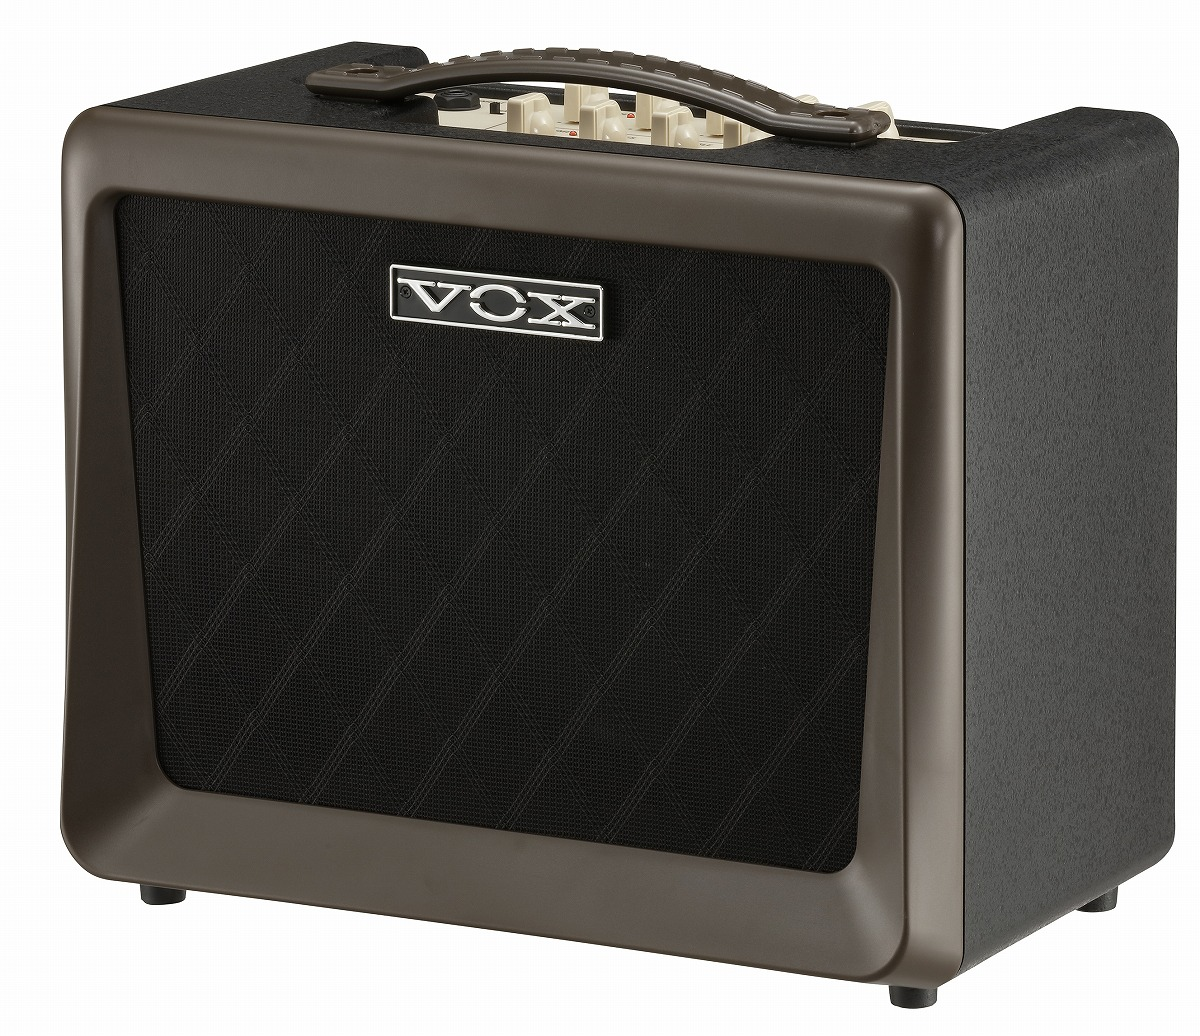 VOX / VX50 AG ボックス アコースティックギターアンプ【YRK】【お取り寄せ商品】